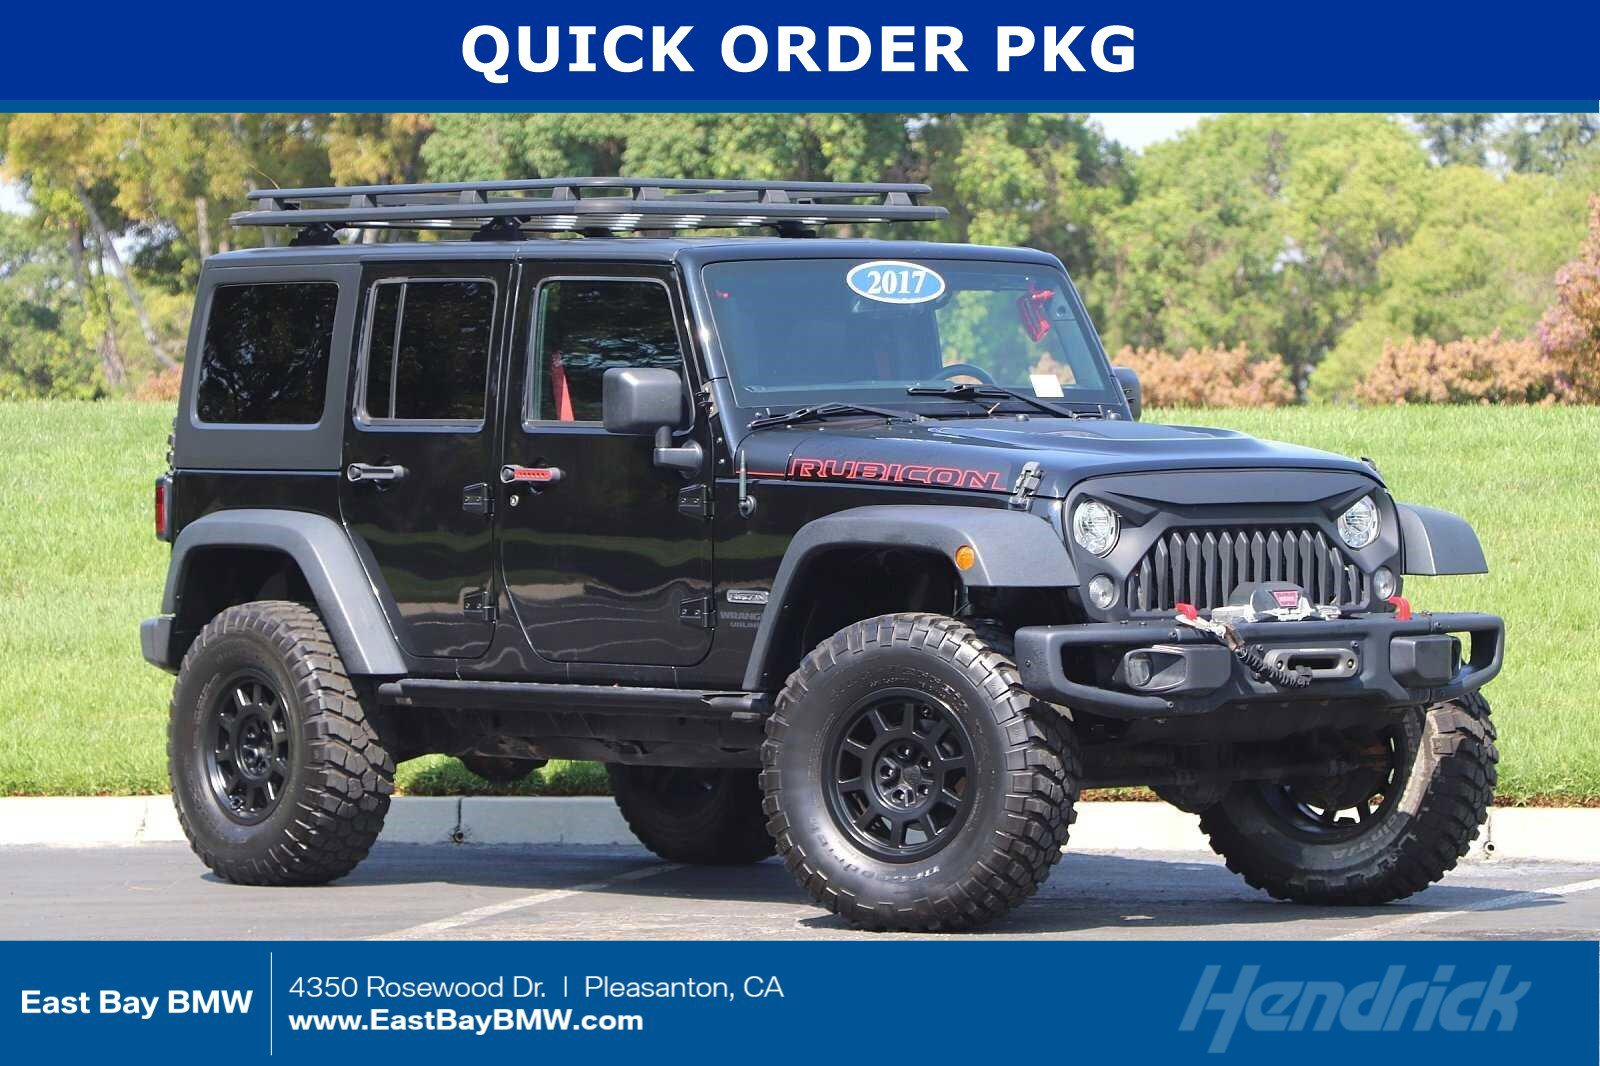 Pre-Owned 2017 Jeep Wrangler Unlimited Rubicon Recon